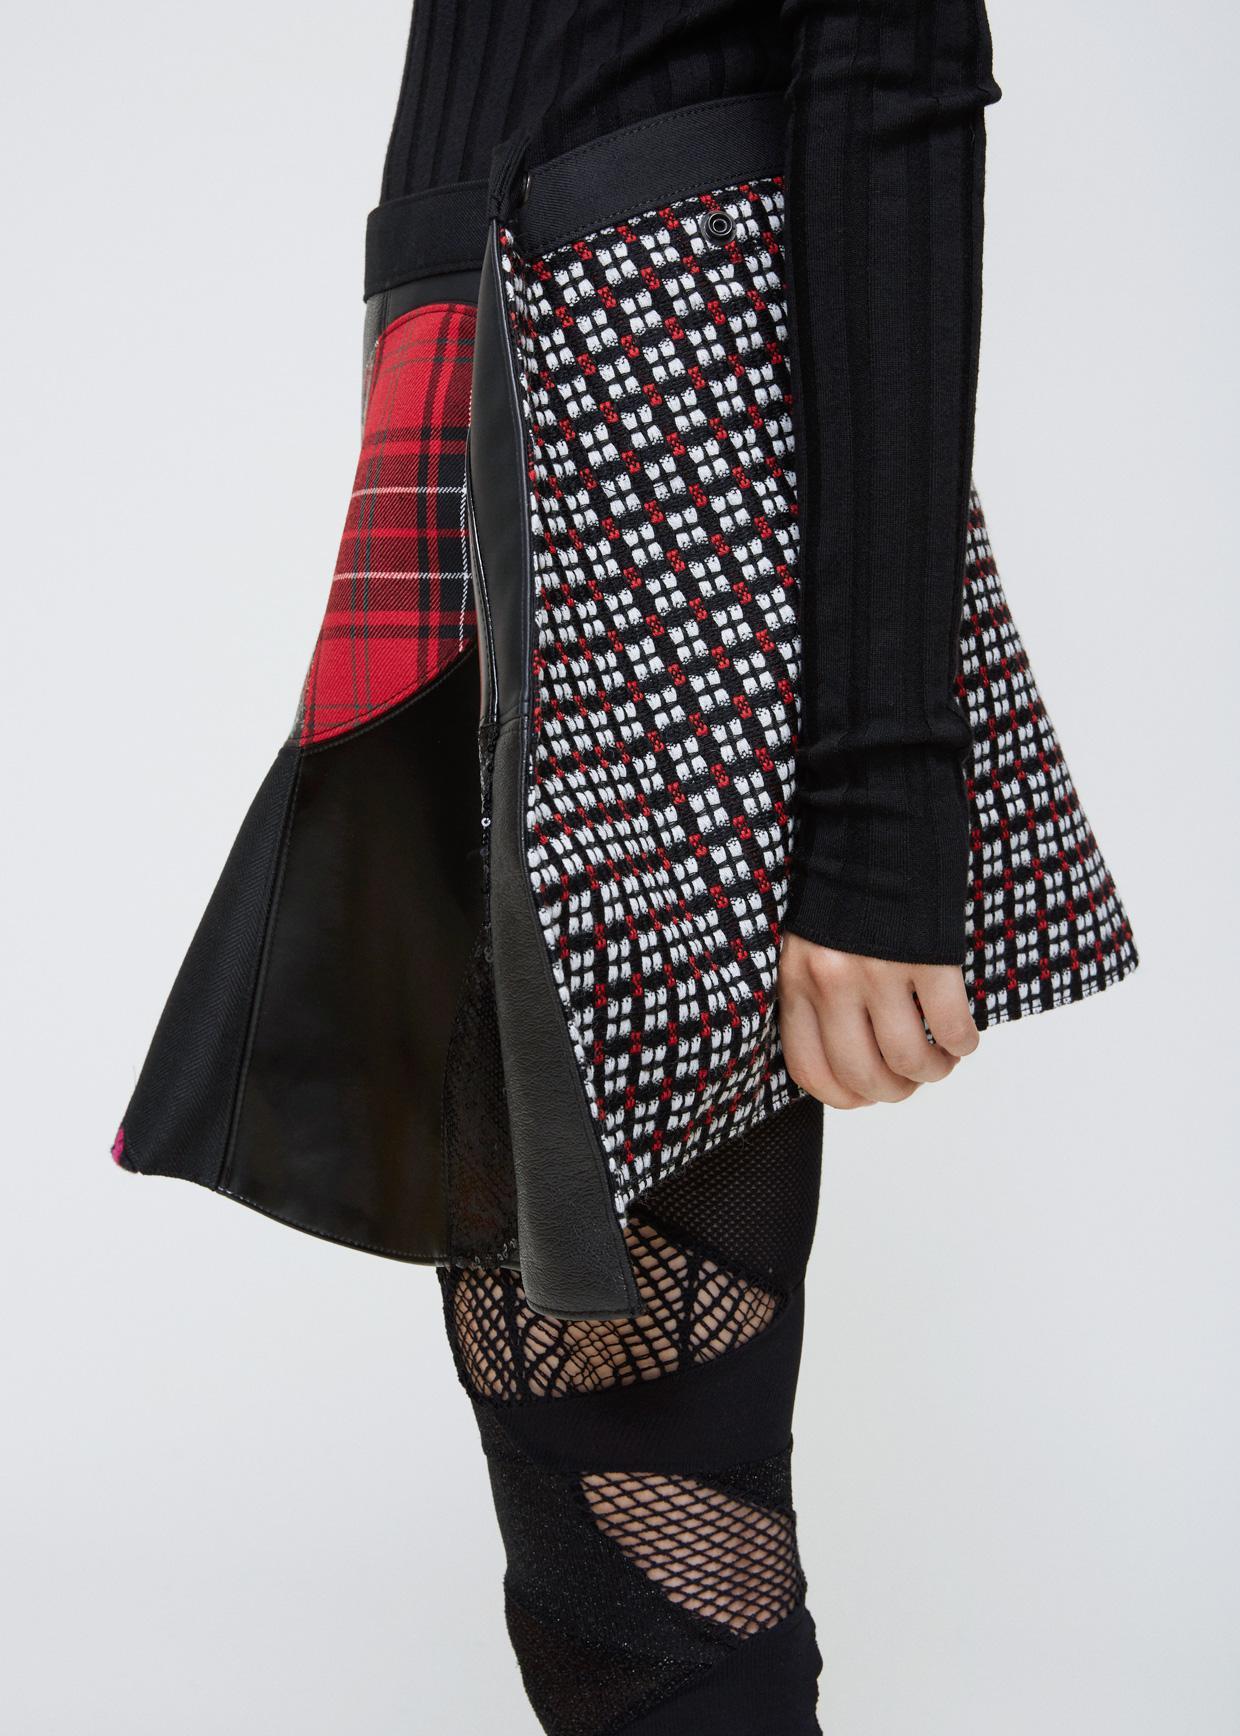 Lyst - Junya Watanabe Black Multi Geometric Knit Pattern Skirt in Black